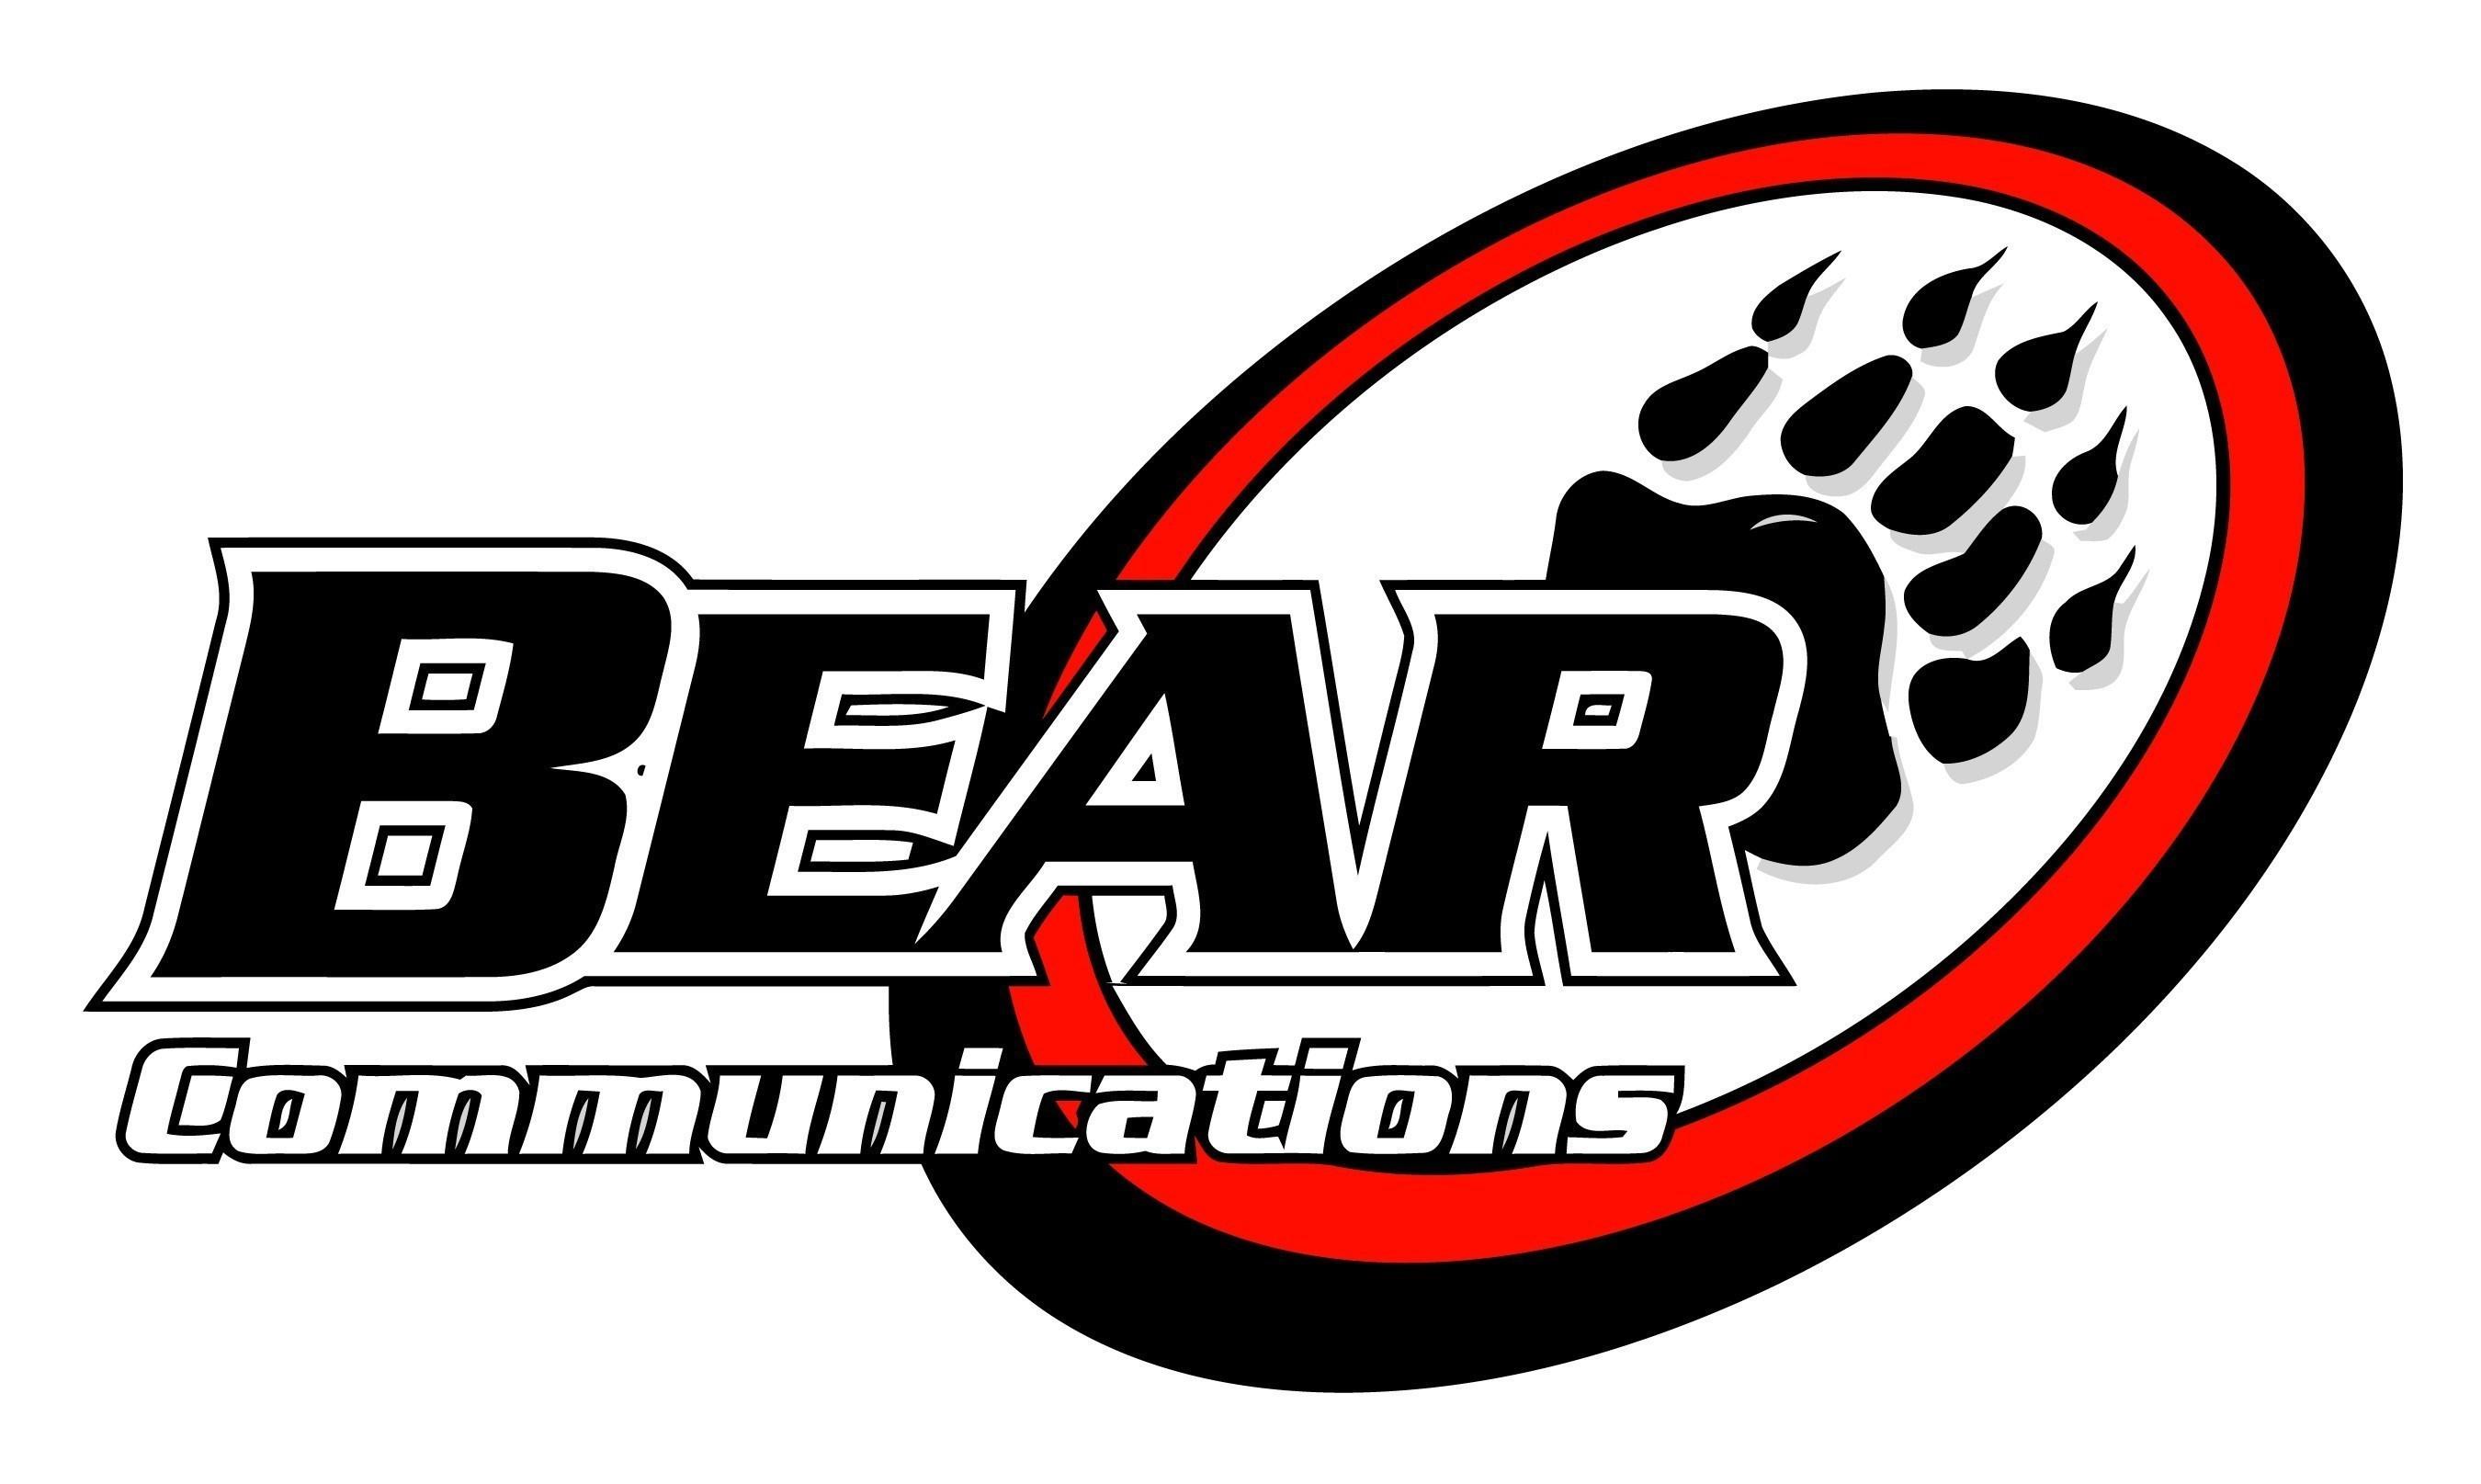 BEAR COMMUNICATIONS AWARDED EXCLUSIVE HUNTSVILLE UTILITIES FIBER NETWORK CONSTRUCTION PROJECT